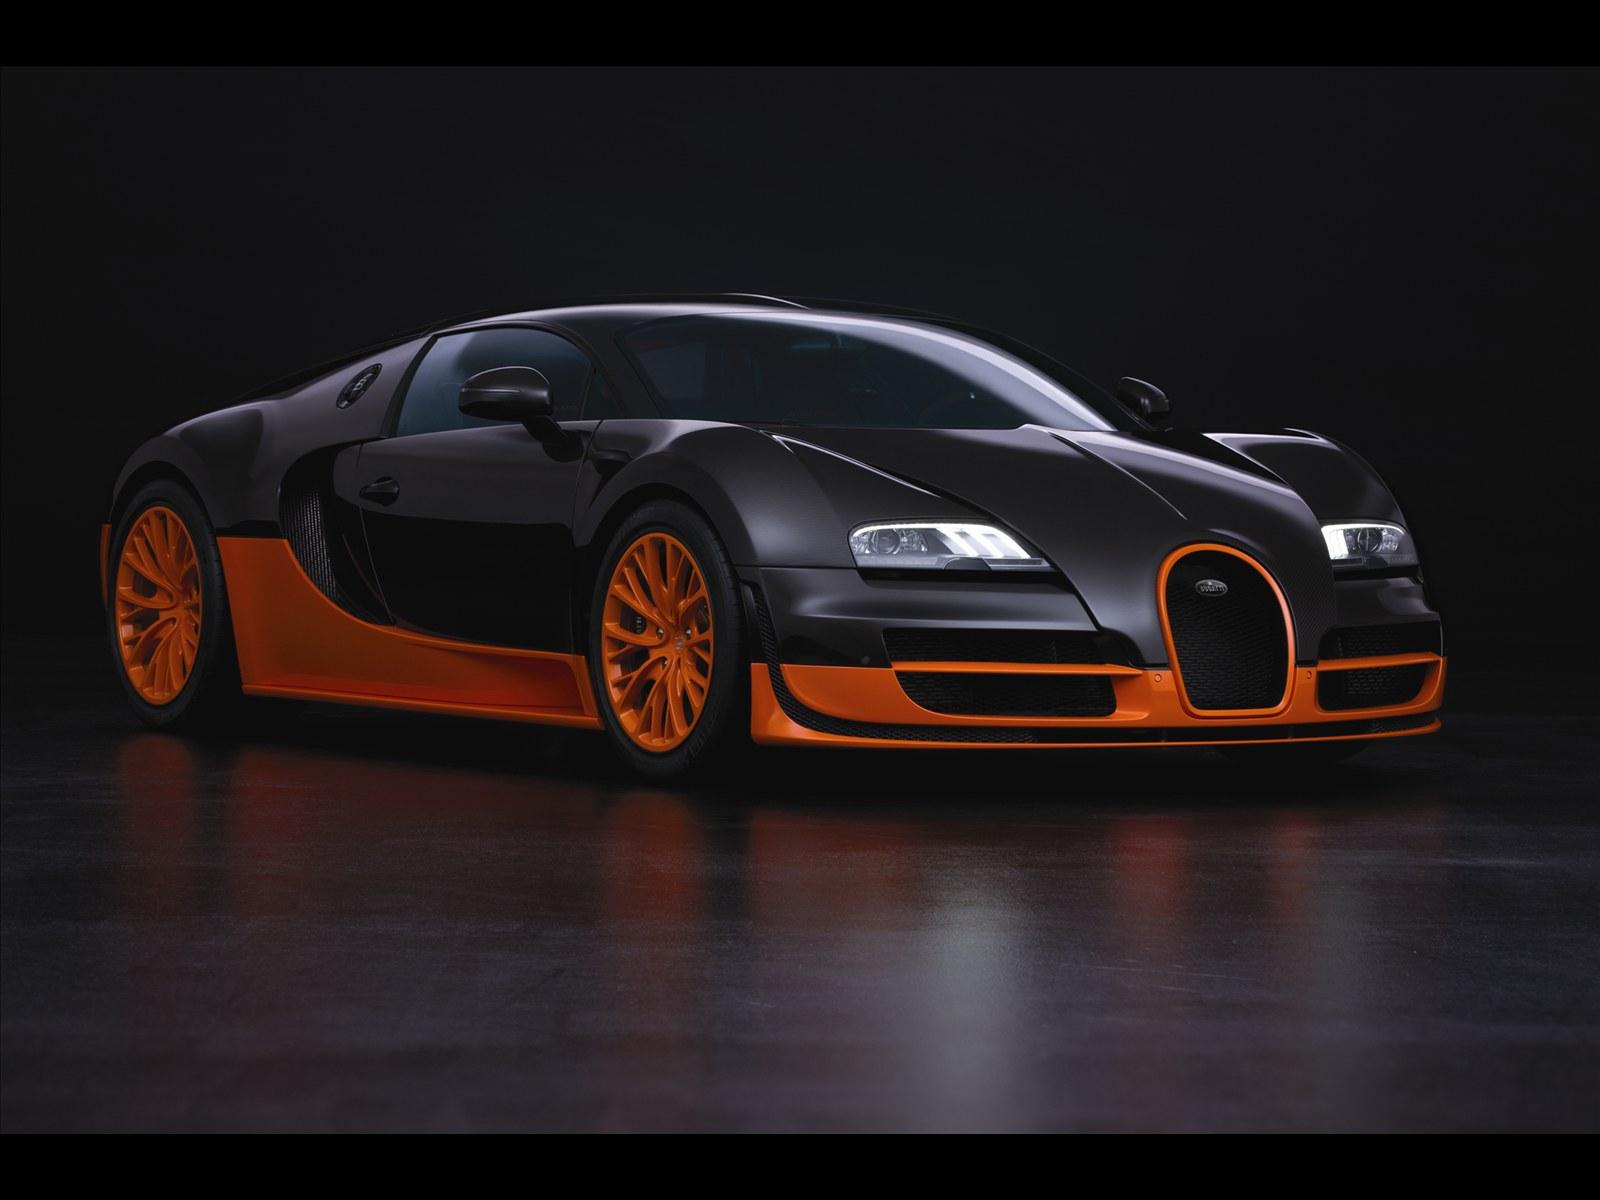 Car Pictures: Bugatti Veyron Super Sport 2011